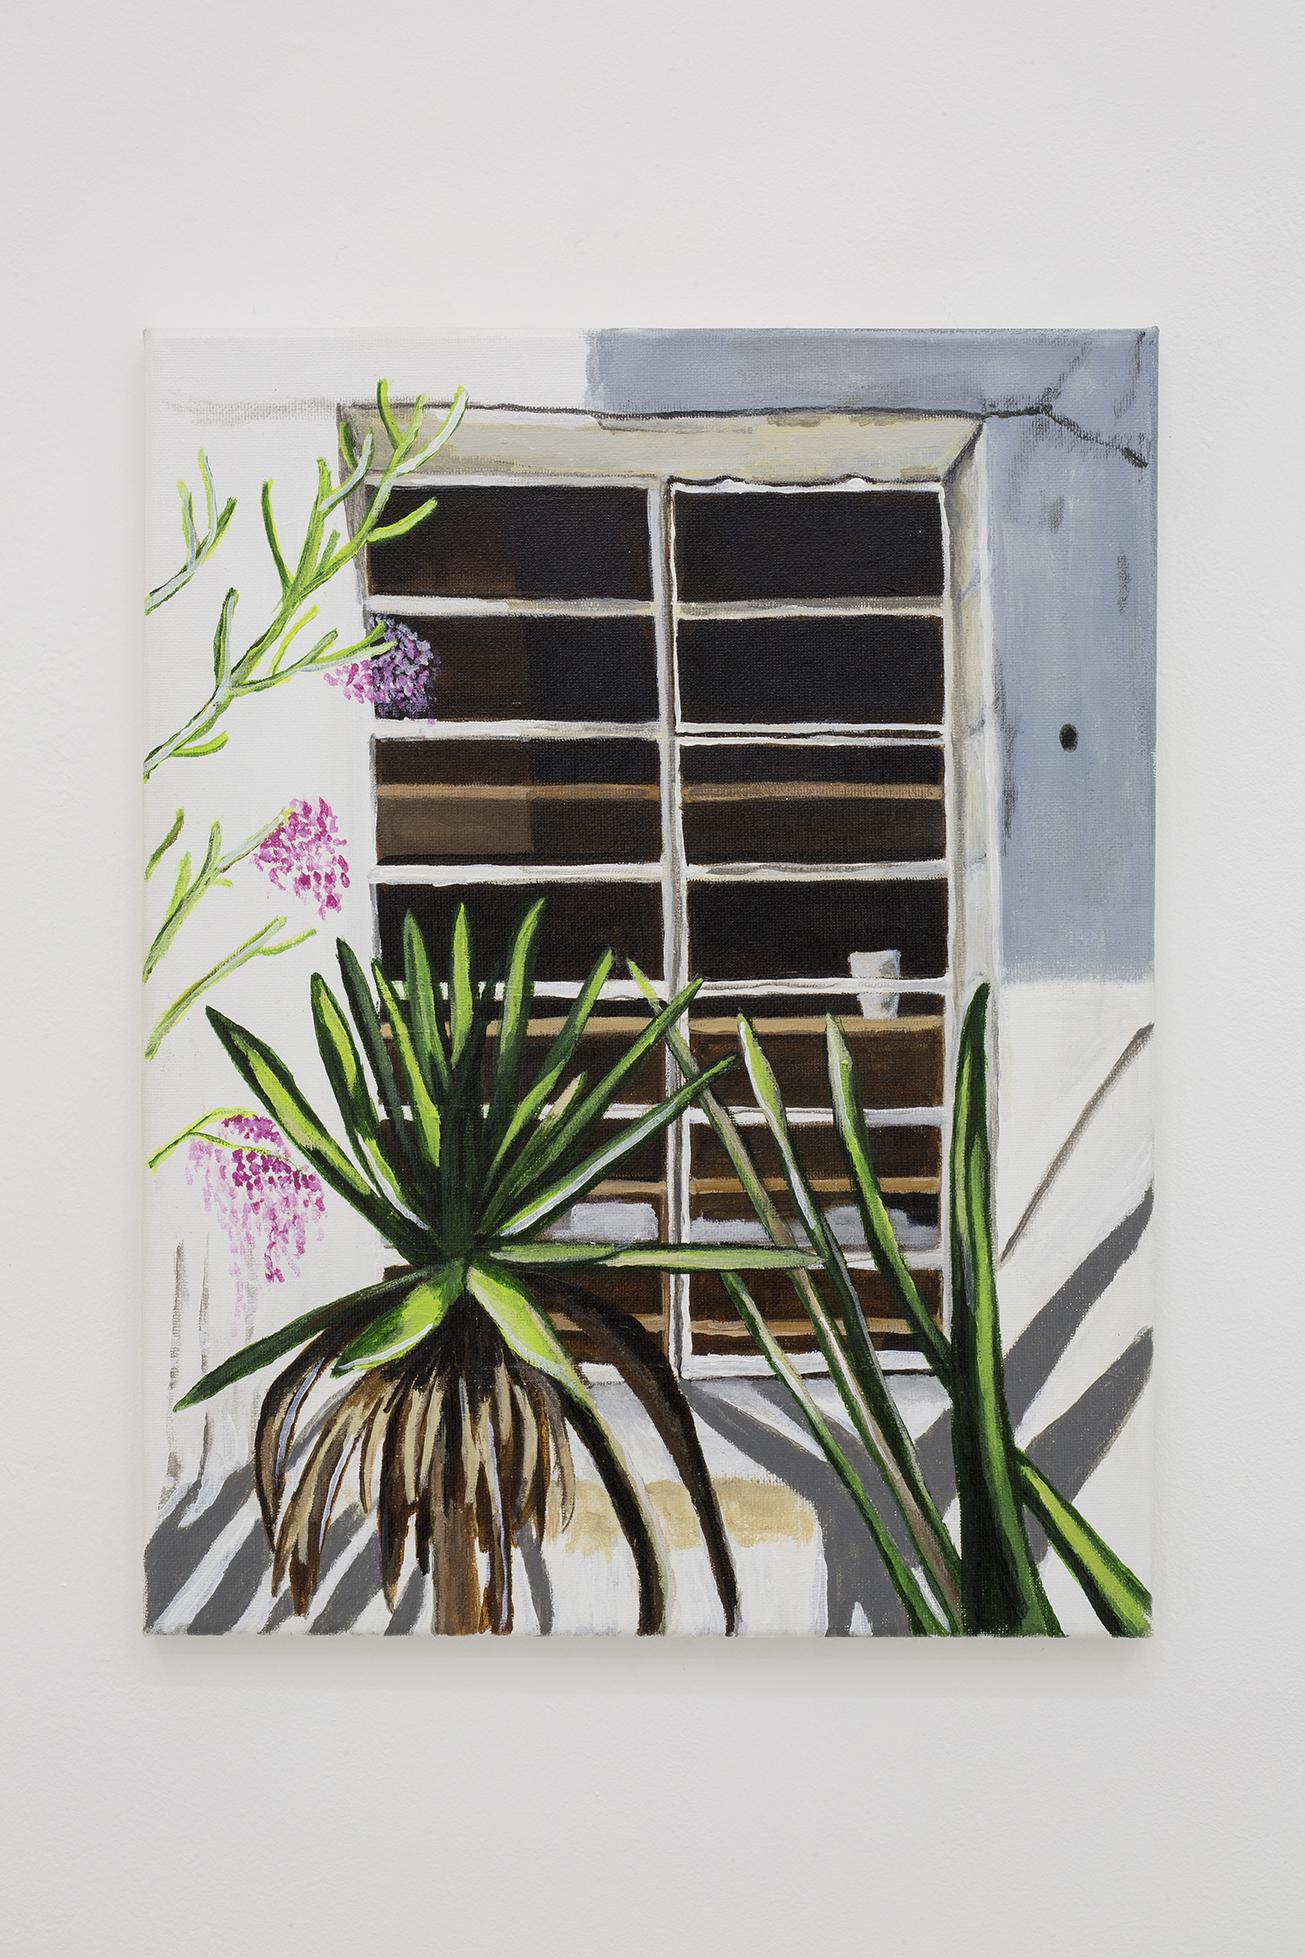 Shana Sharp, La Ventana, 2018. Acrylic on canvas.  11 x 14 inch (27.94 x 35.56 cm)